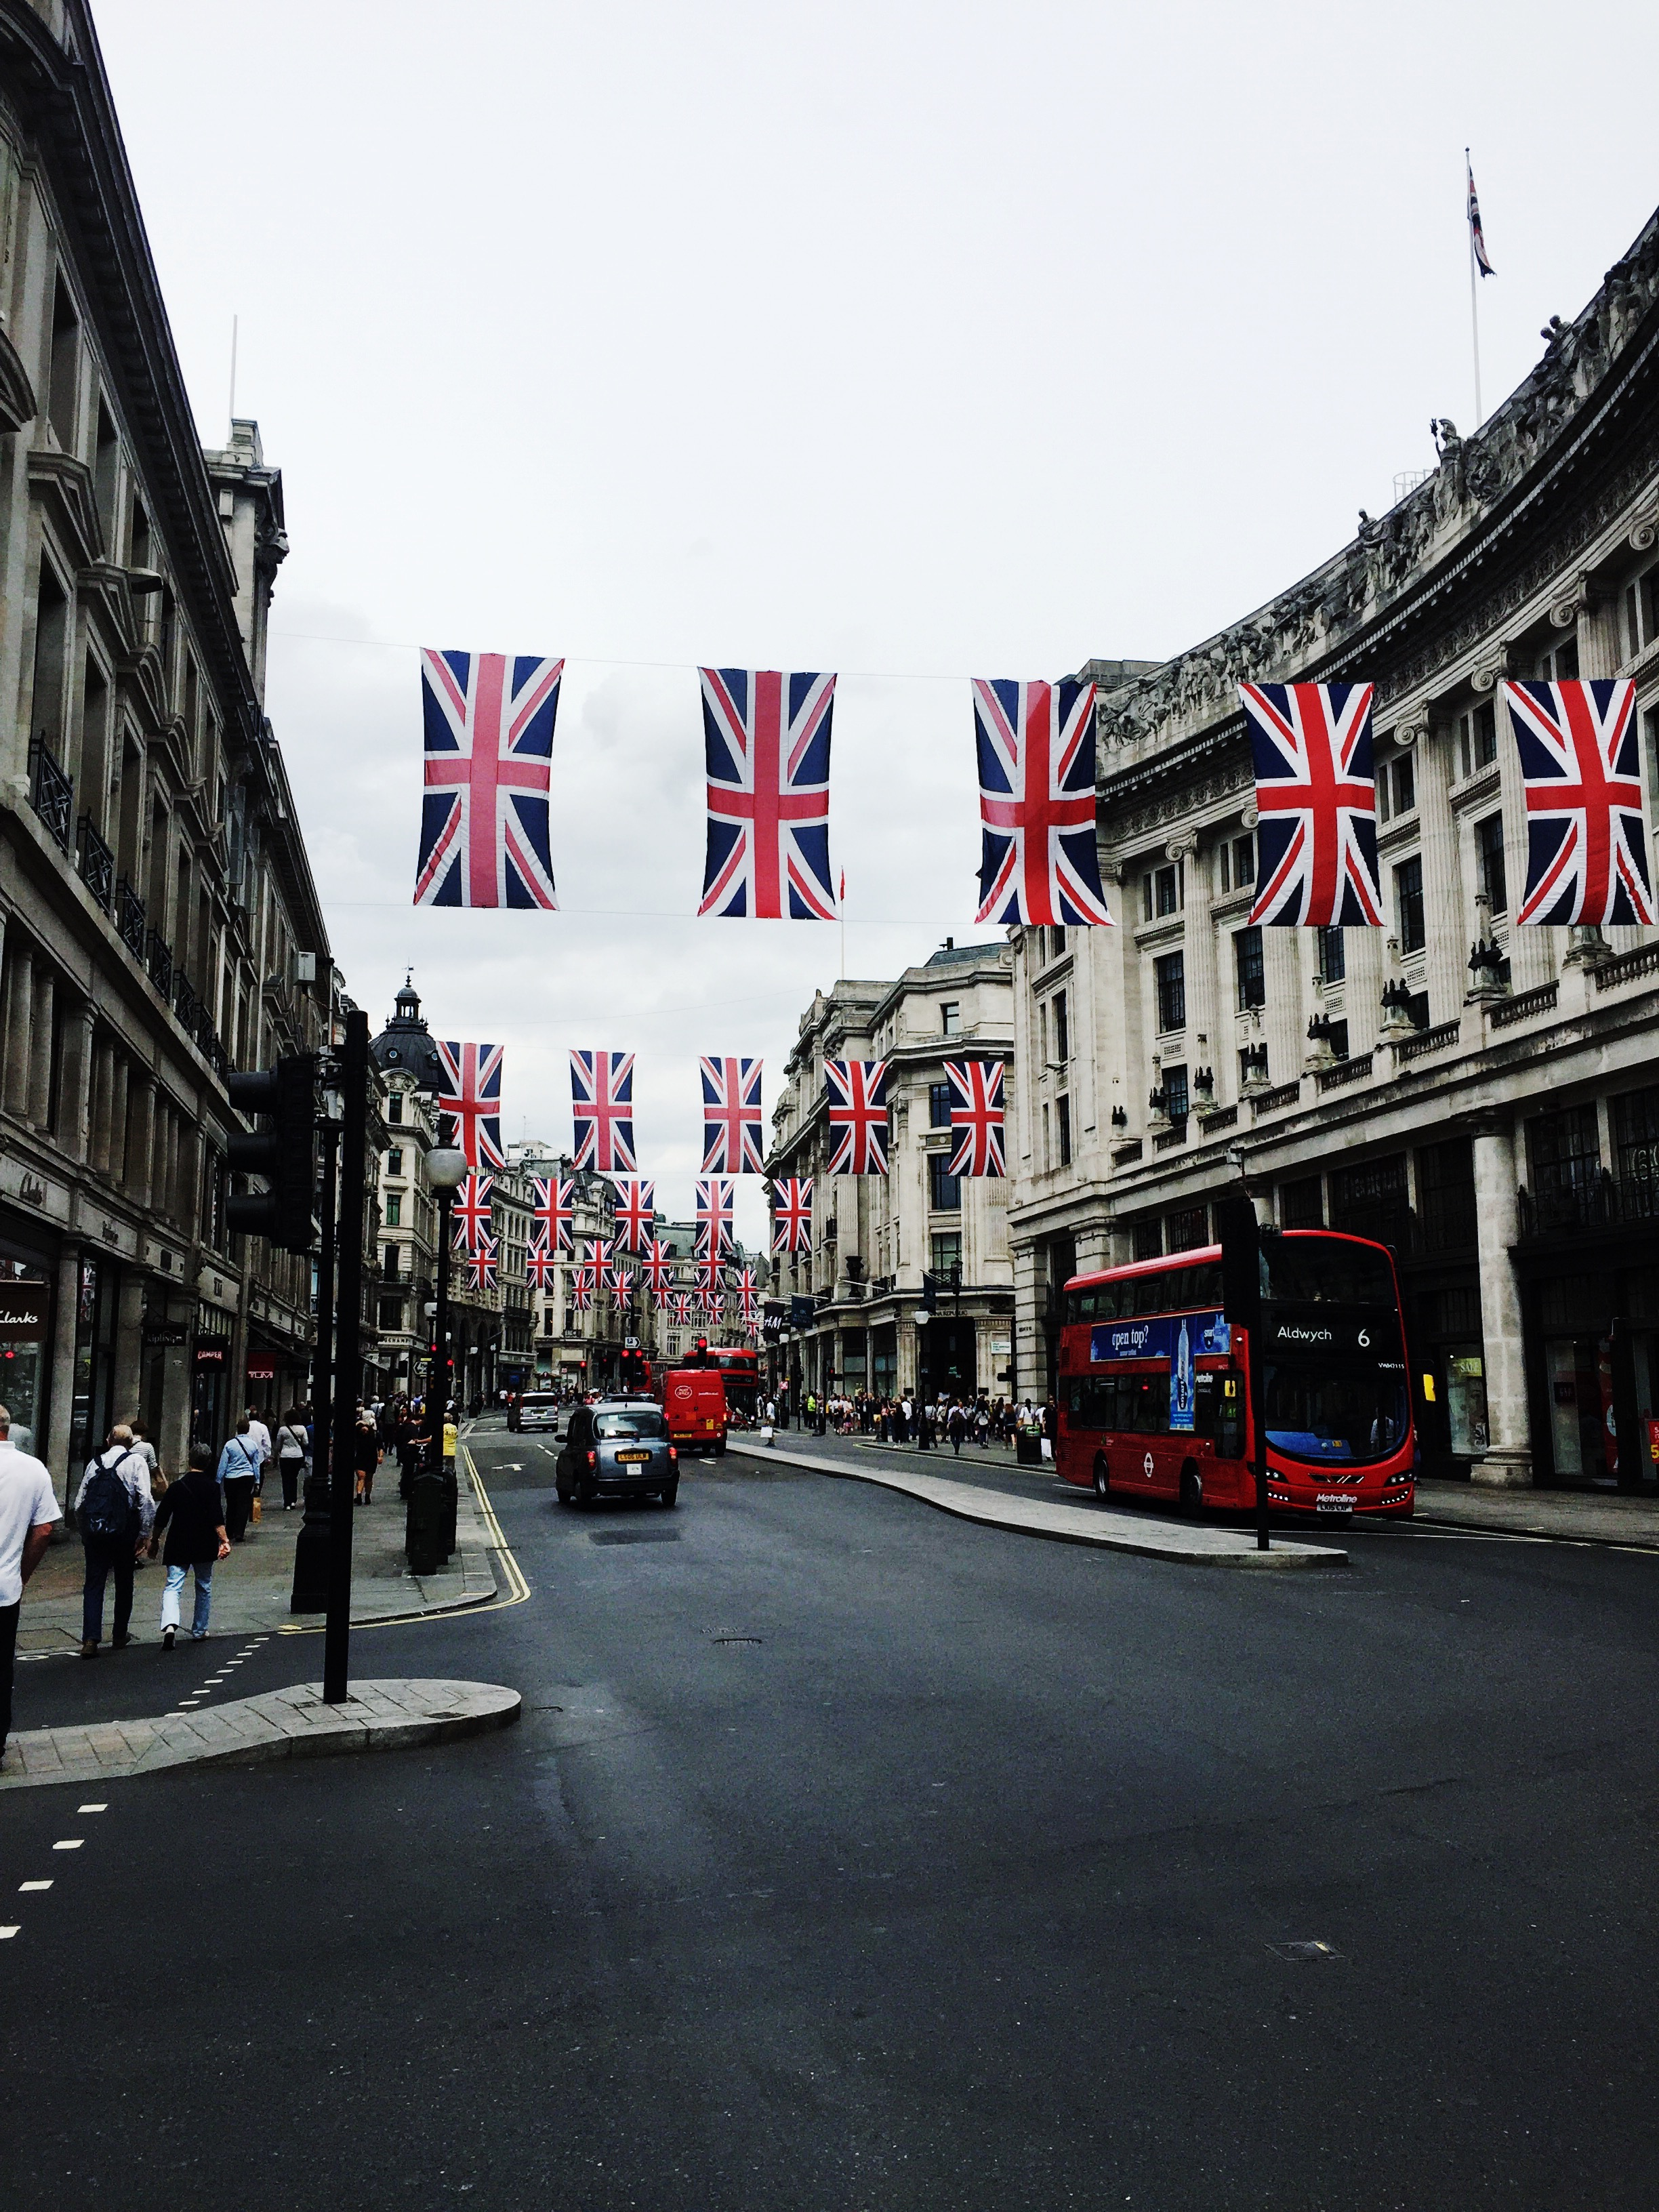 London celebrates Queen Elizabeth's 90th birthday